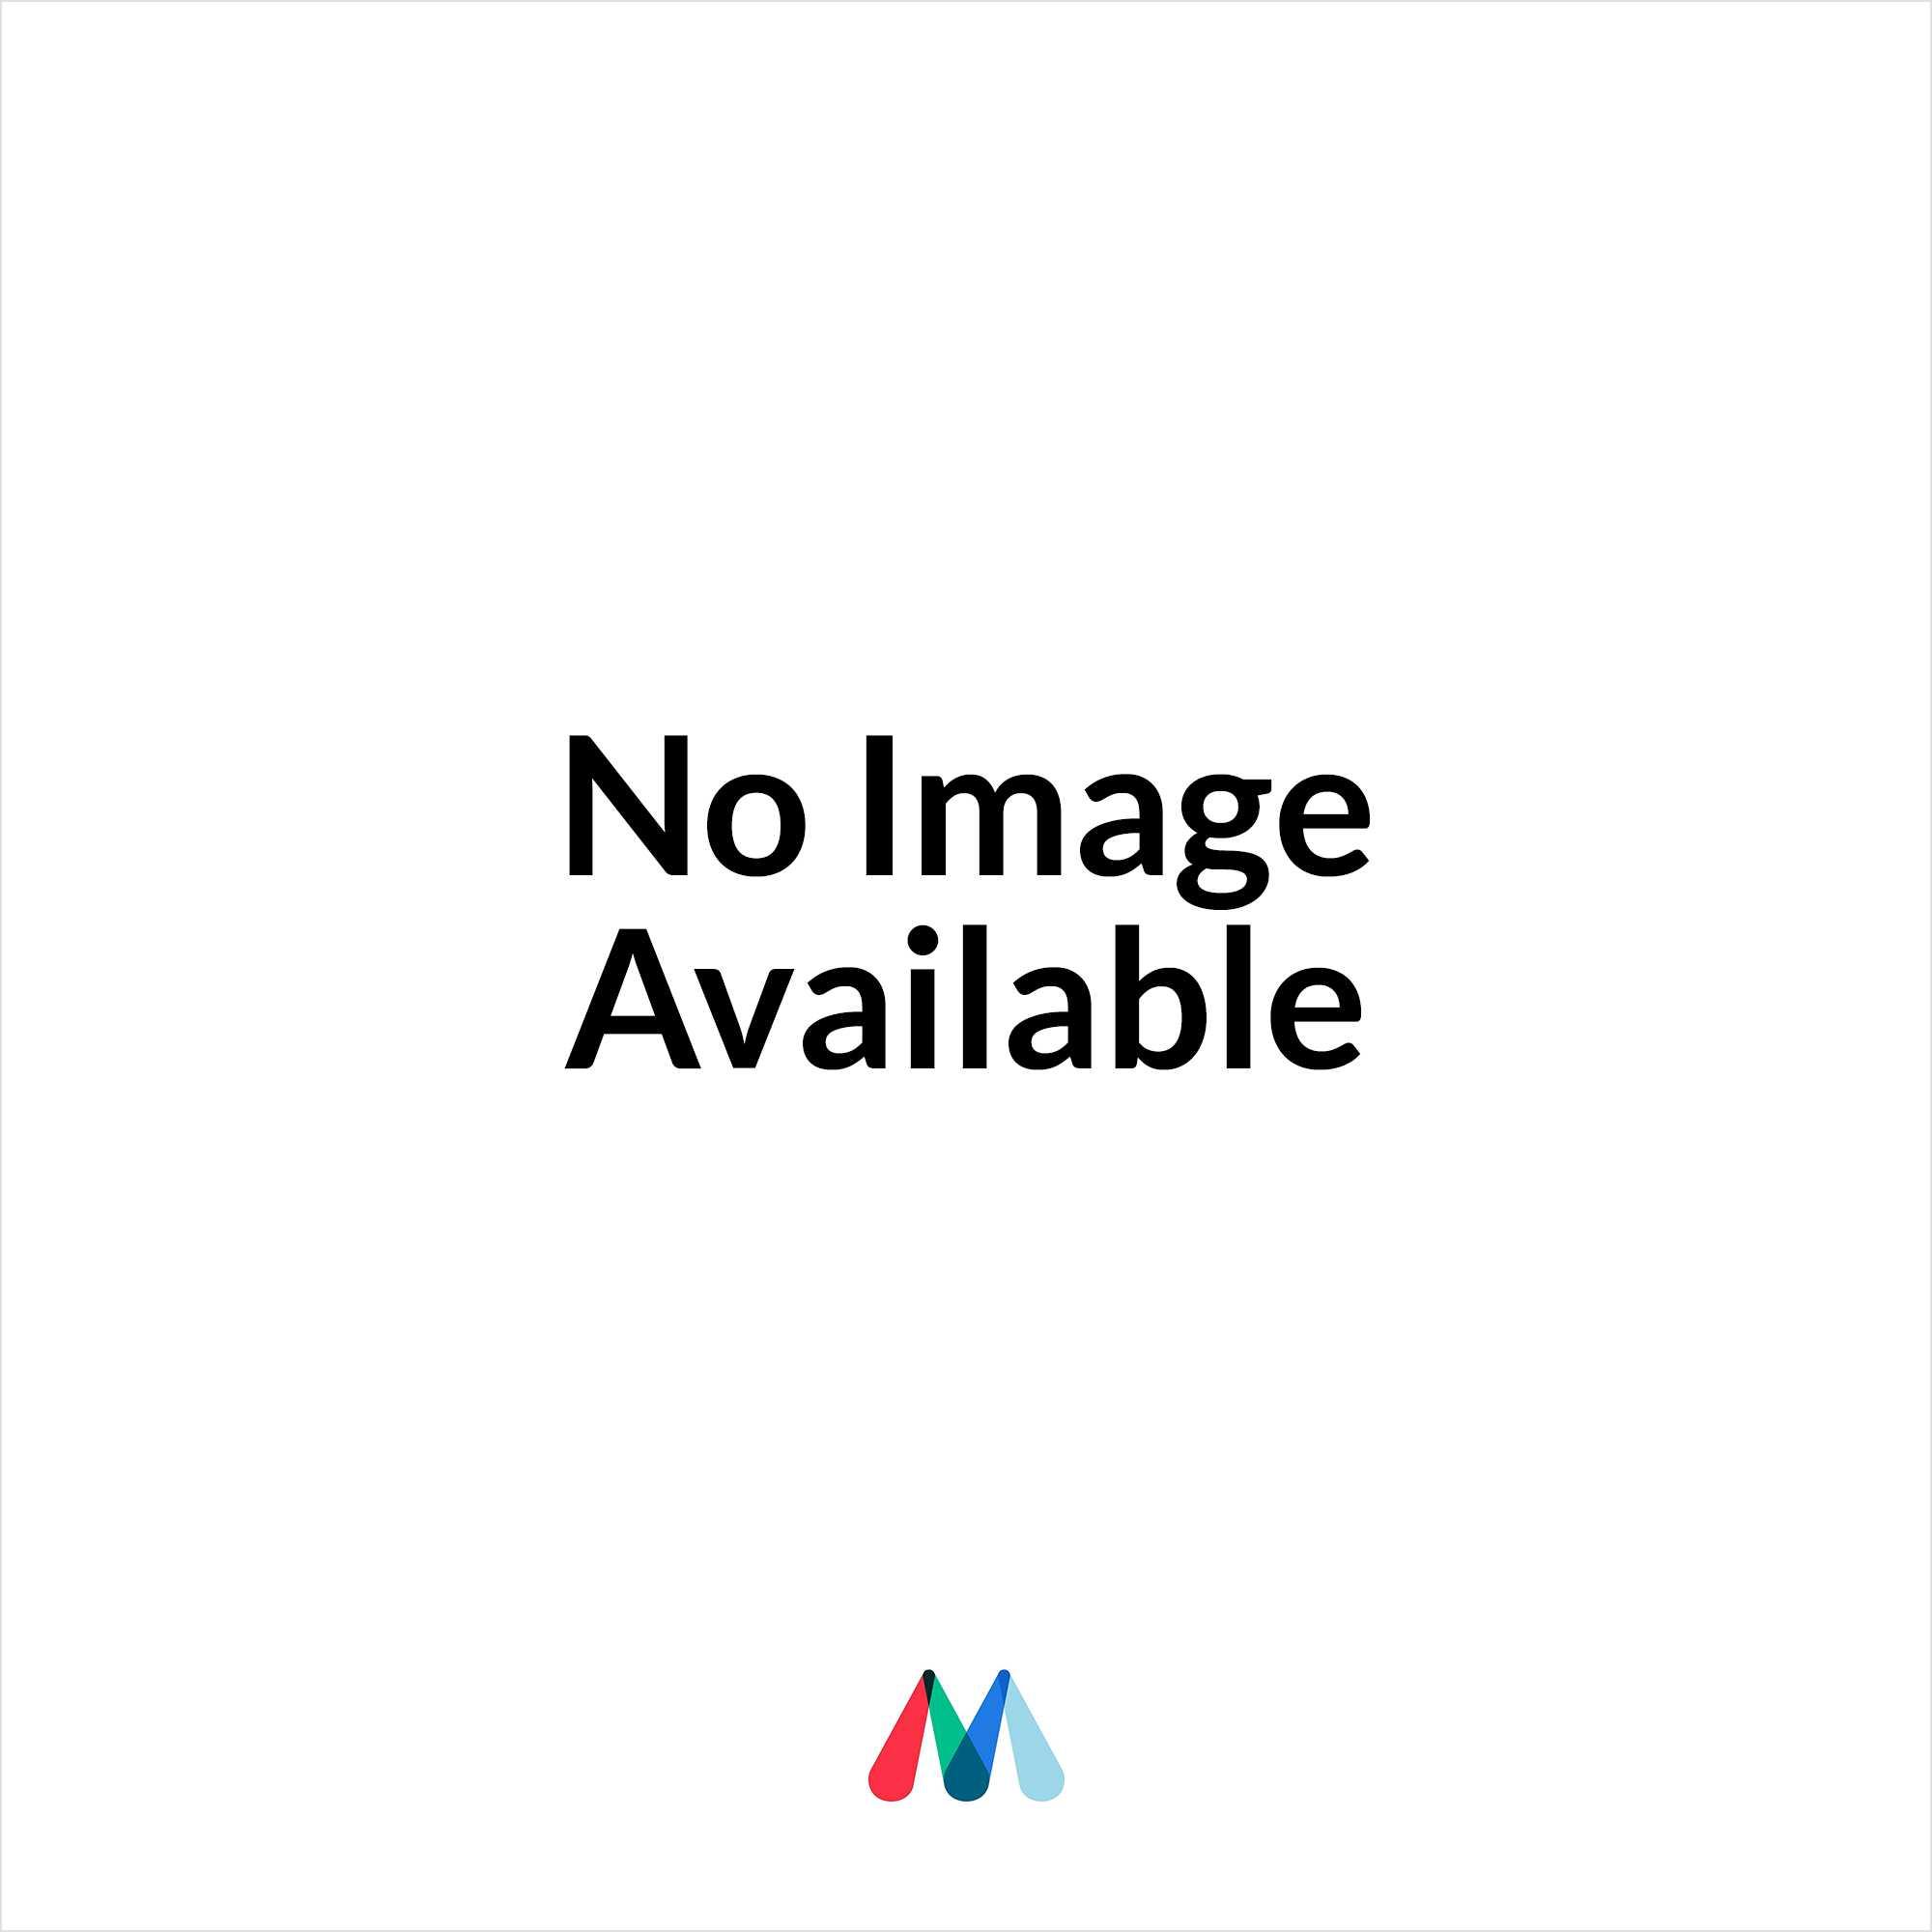 Tiffany Glass Hector medium table lamp